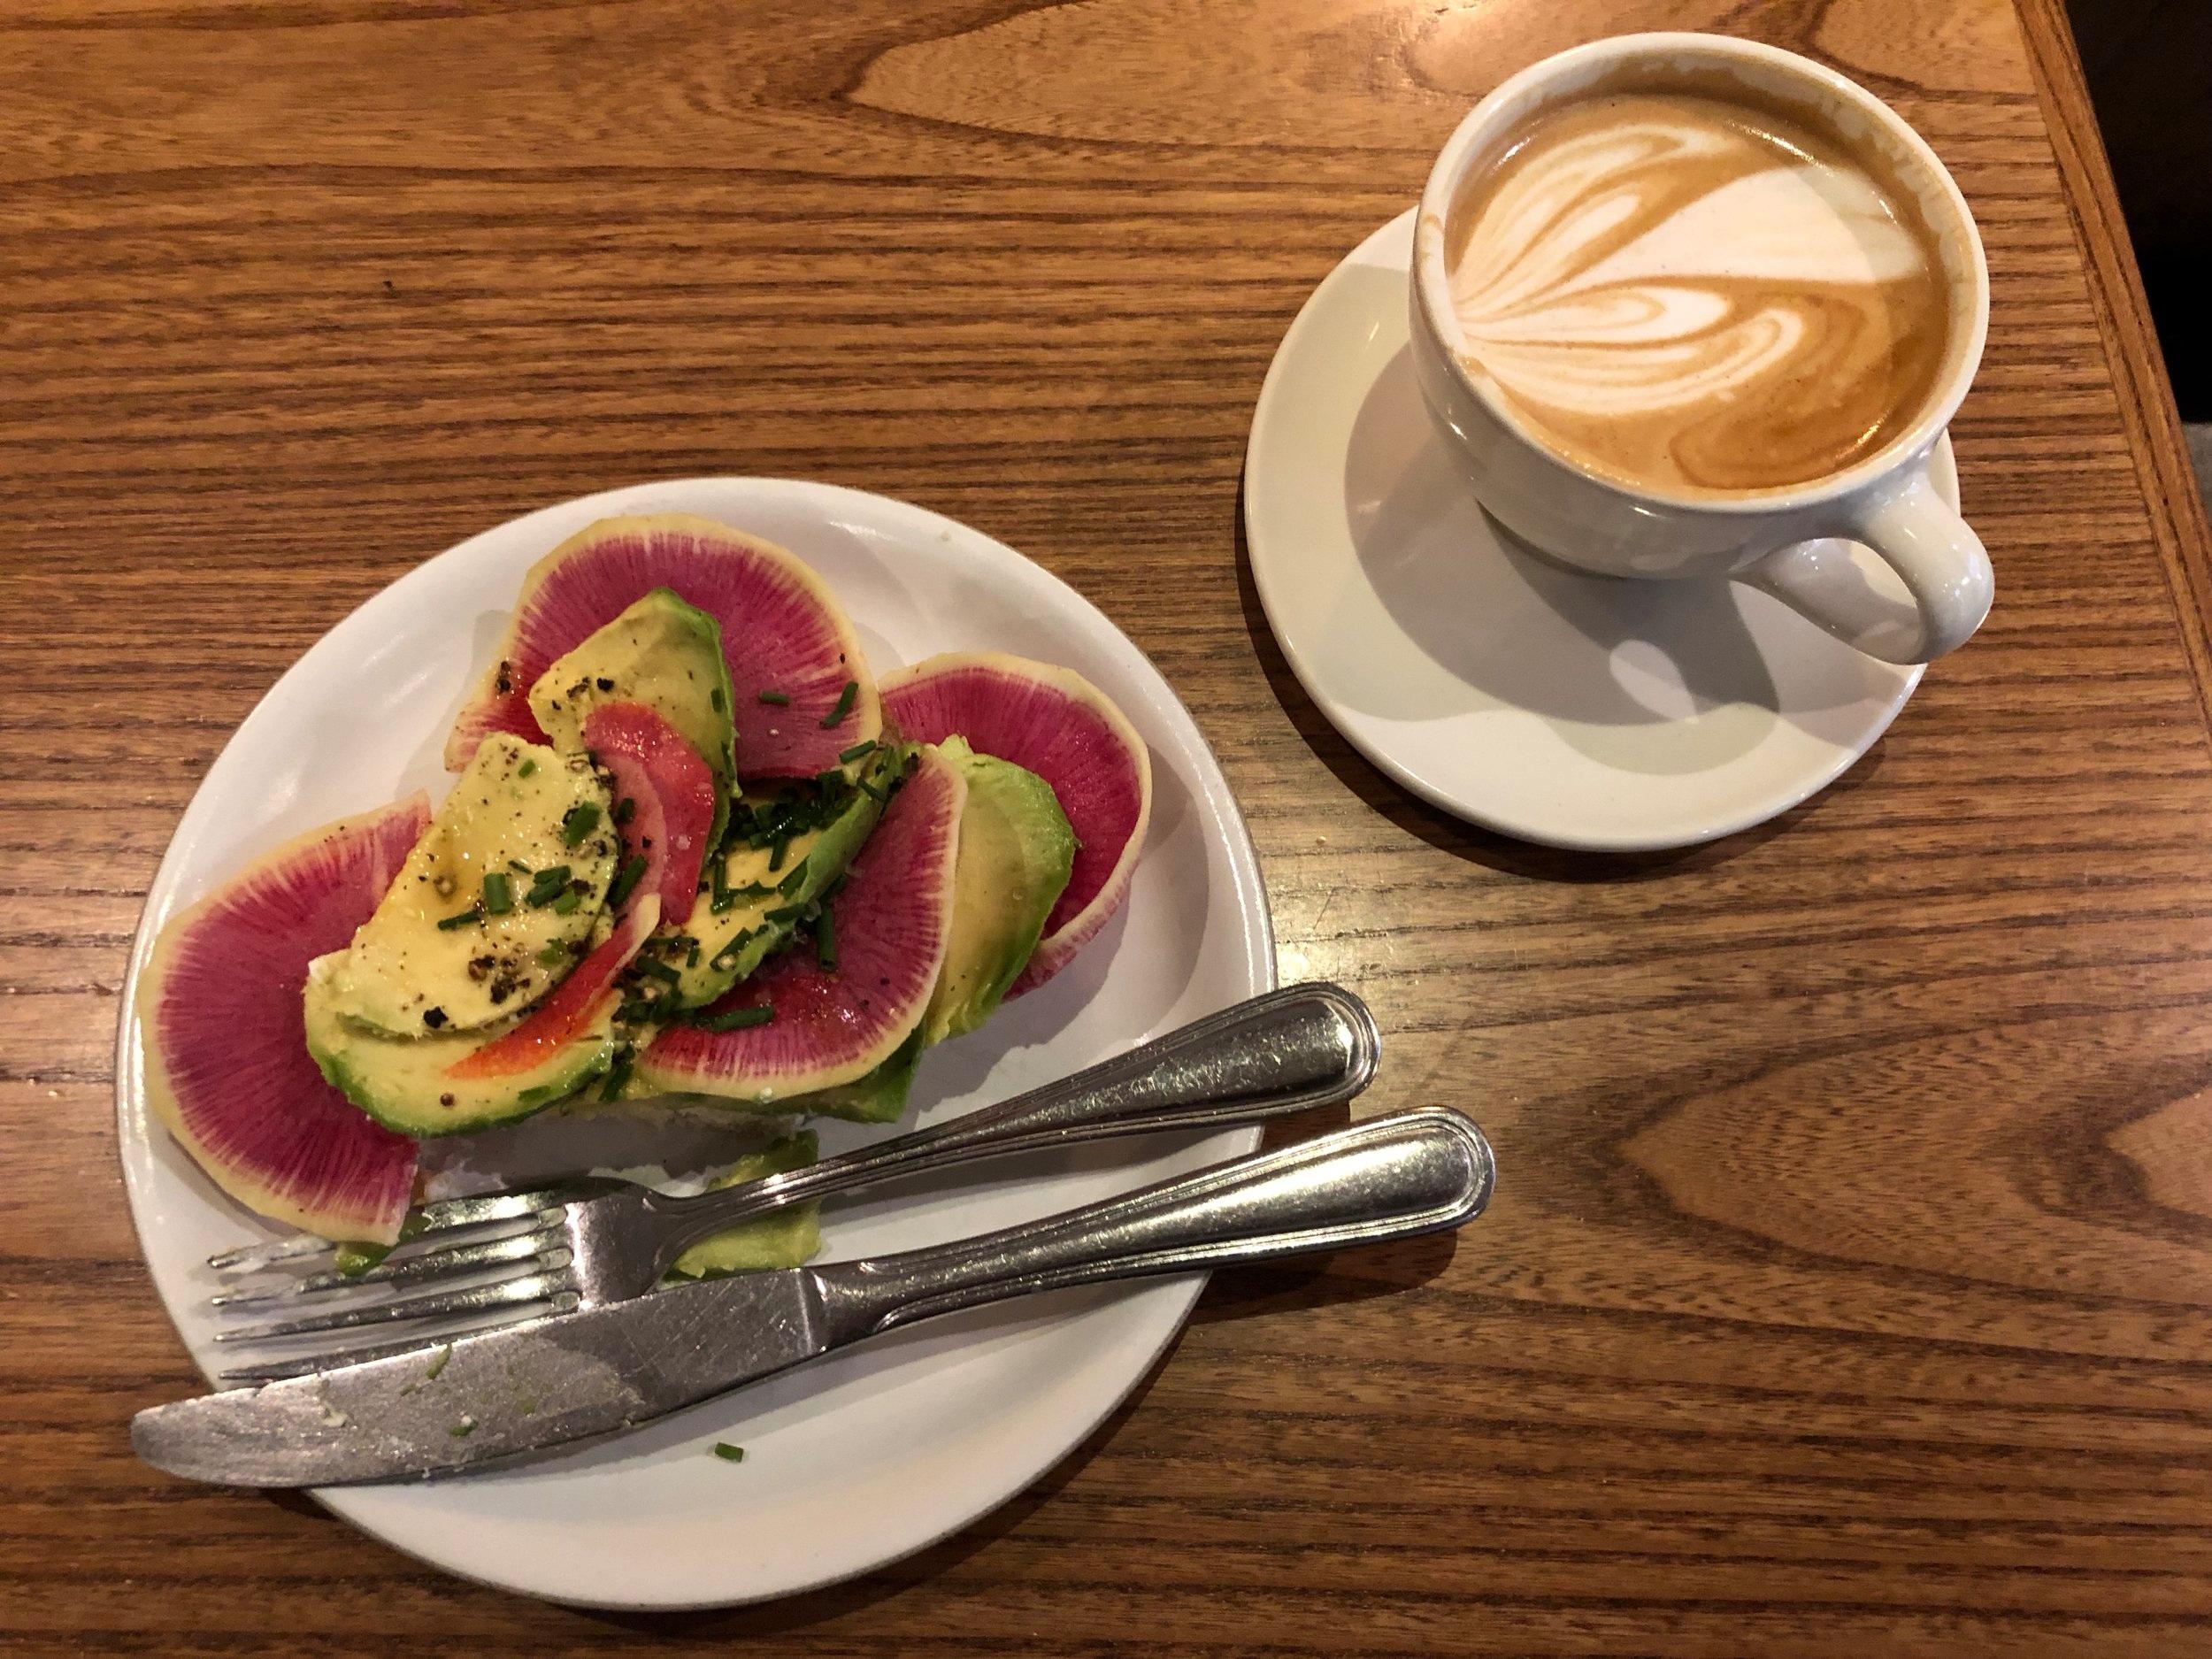 Gluten-free avocado toast at Mazarine Coffee